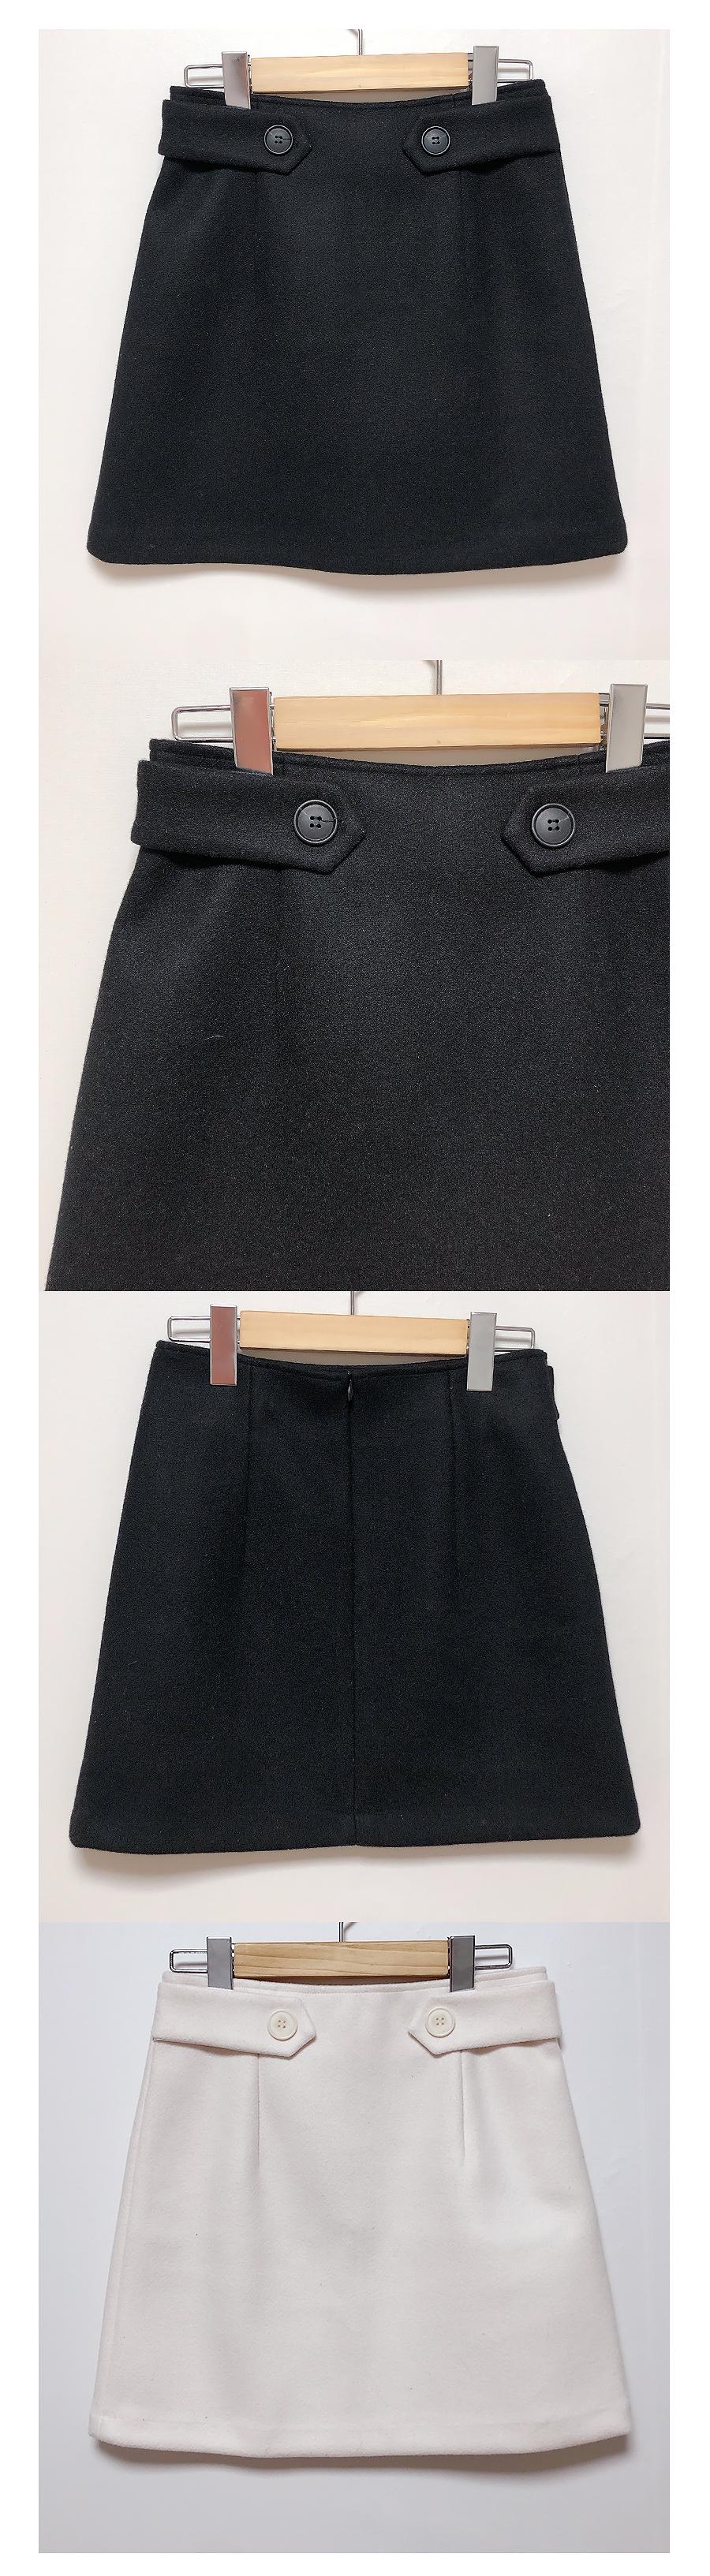 Le A button skirt